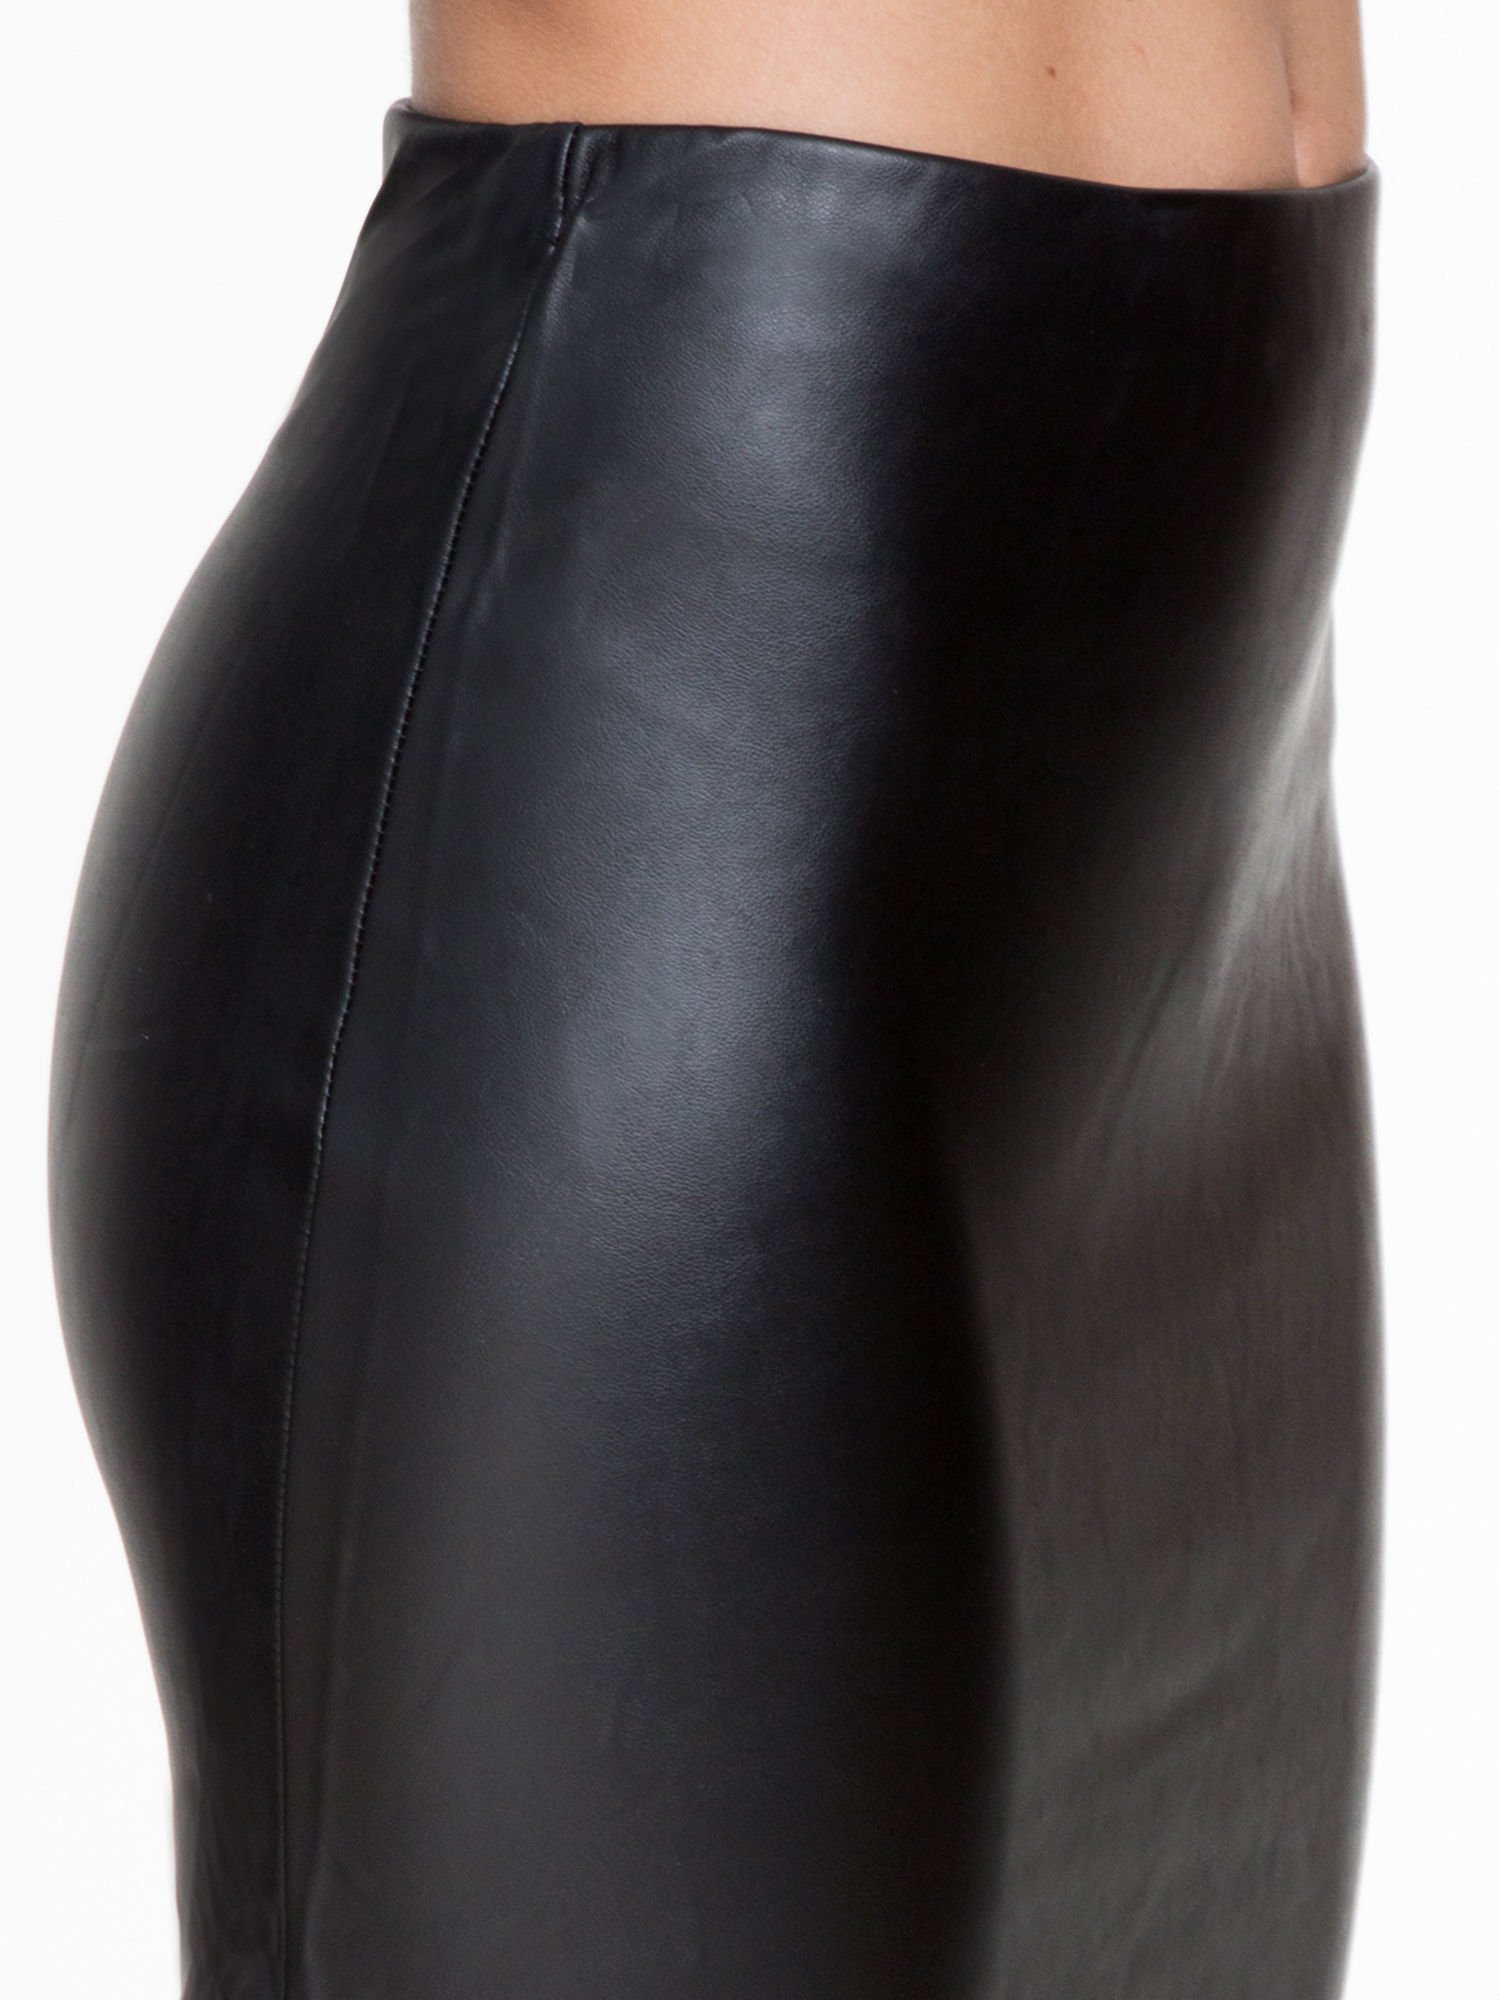 Czarna skórzana spódnica midi                                  zdj.                                  5